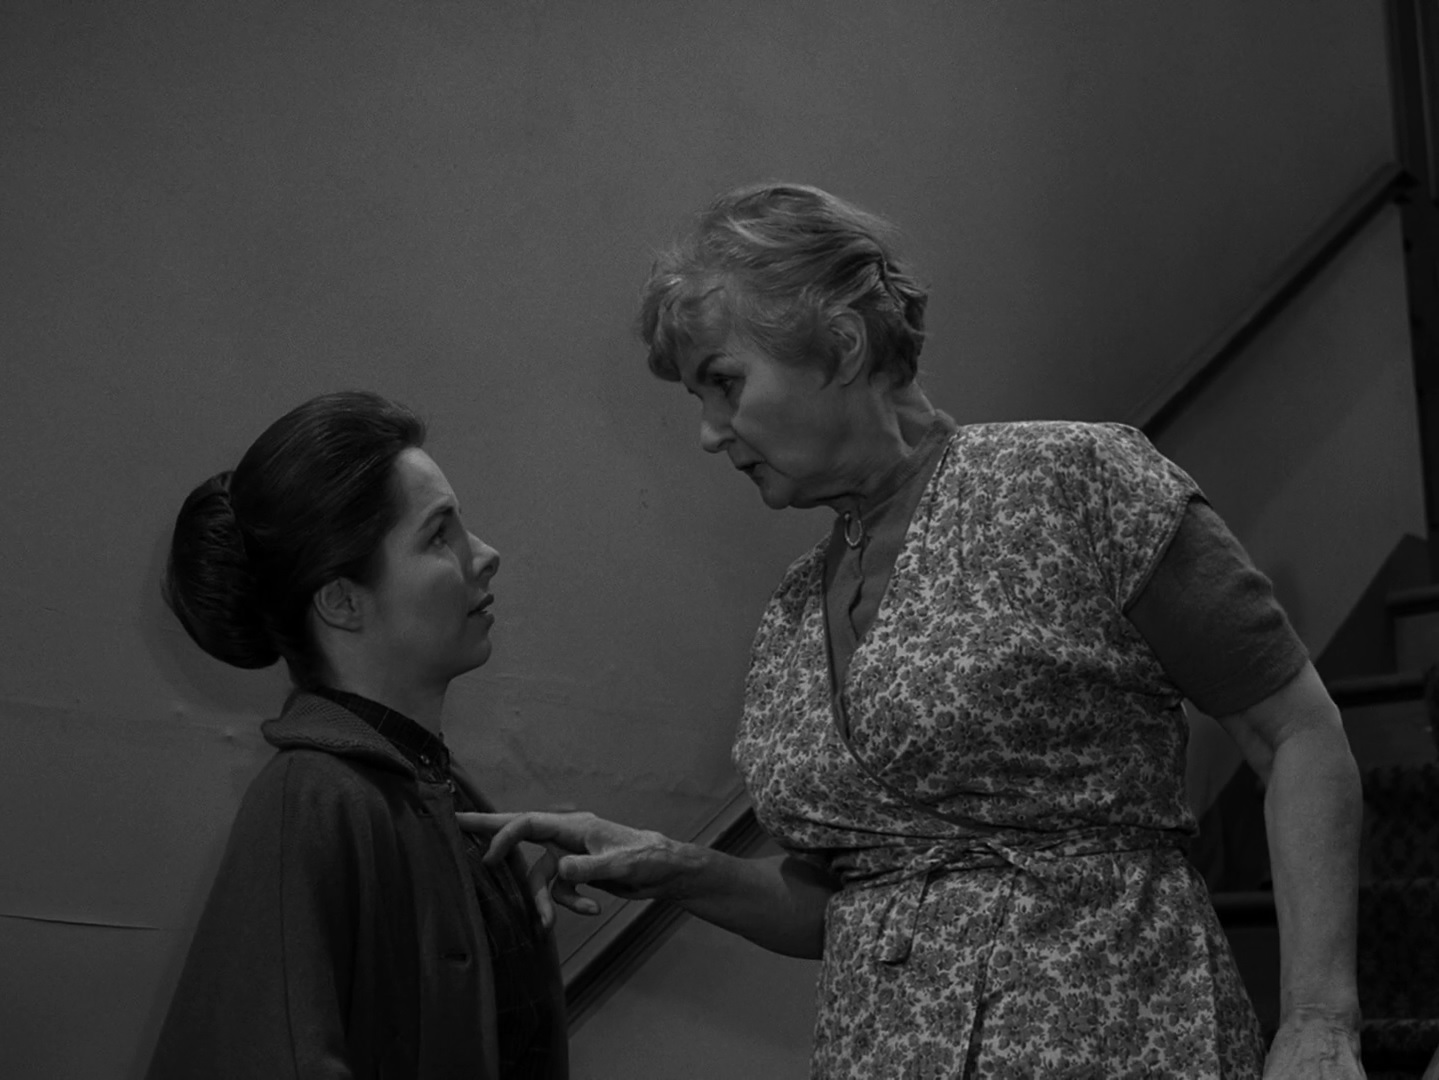 The Twilight Zone Episode 94: Four O'Clock - Midnite Reviews